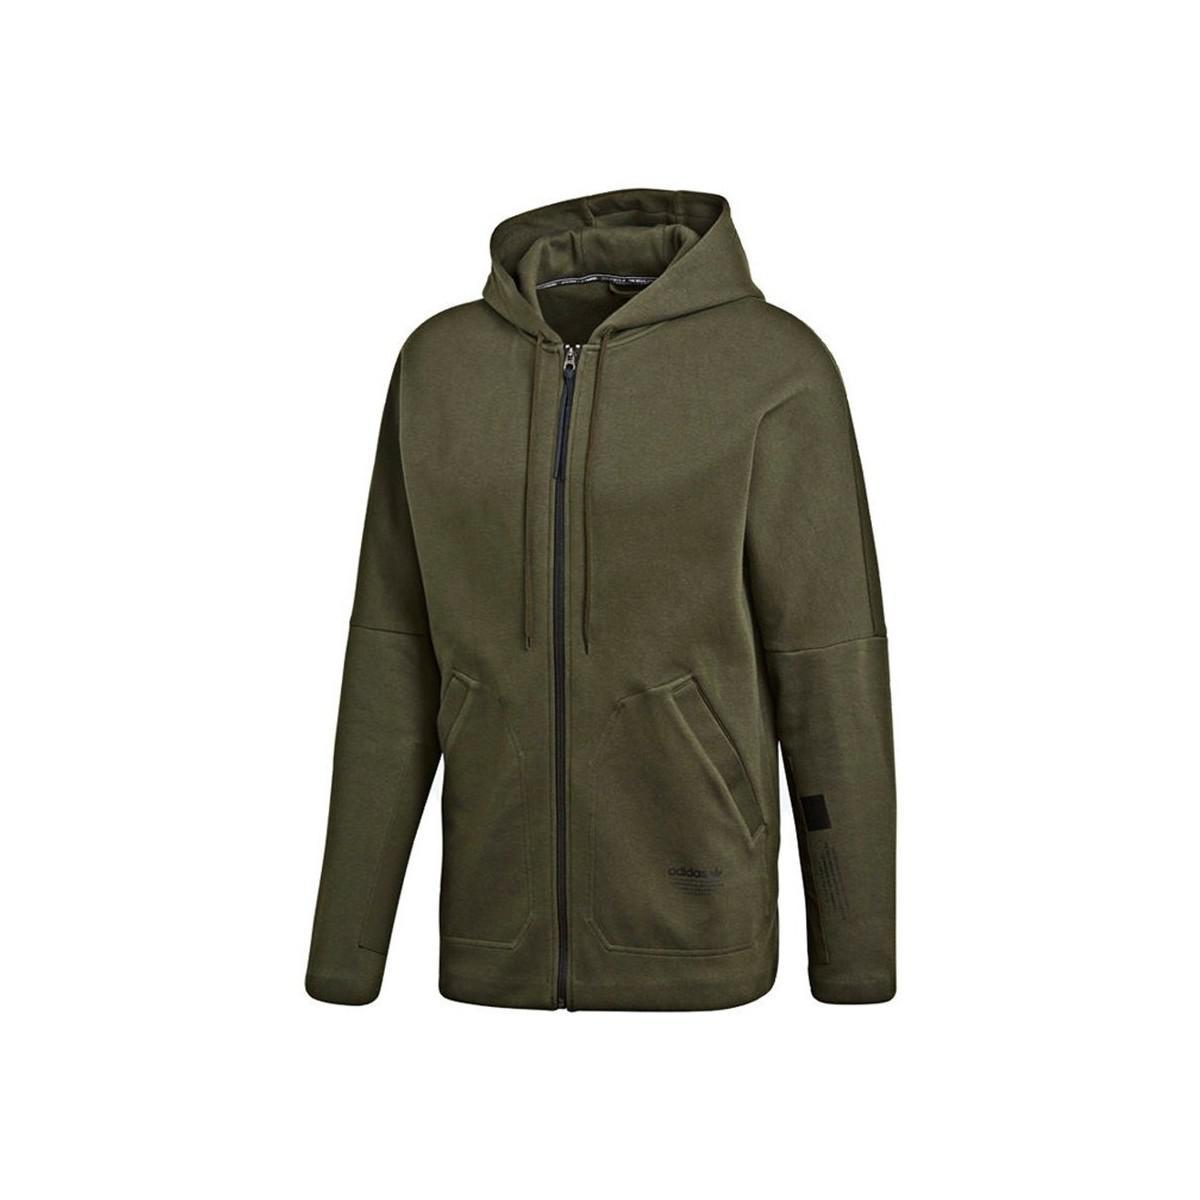 f83a99ef8772 adidas Originals Nmd Pullover Hoodie Men s Sweatshirt In Green in ...